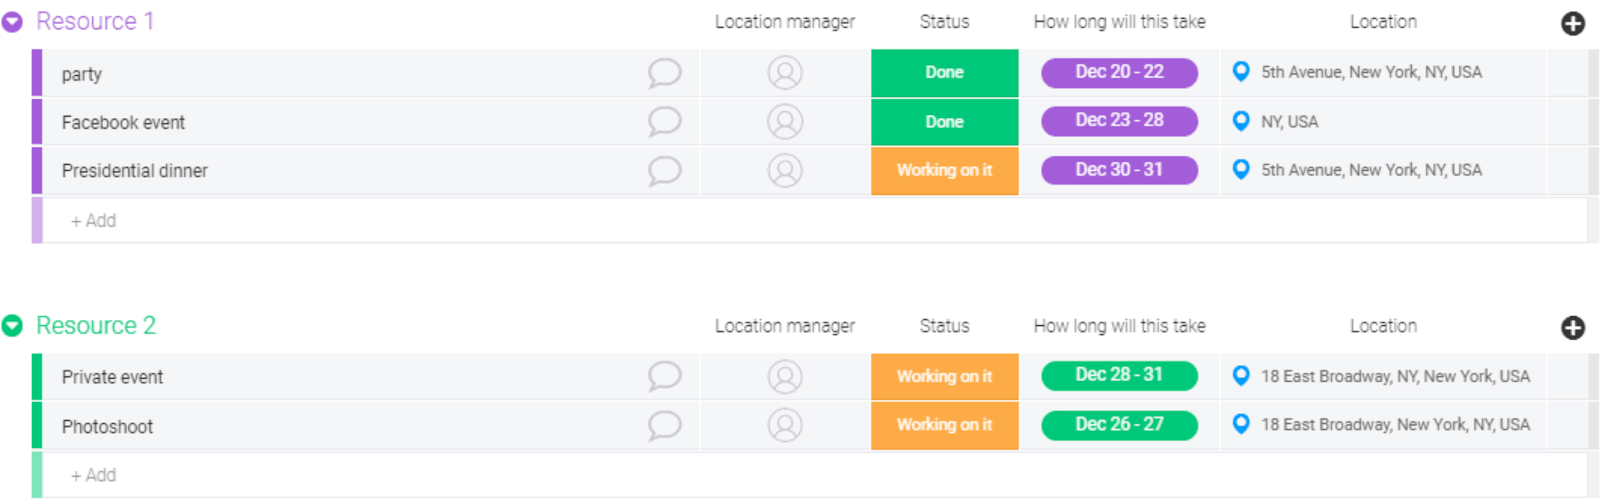 monday.com resource management